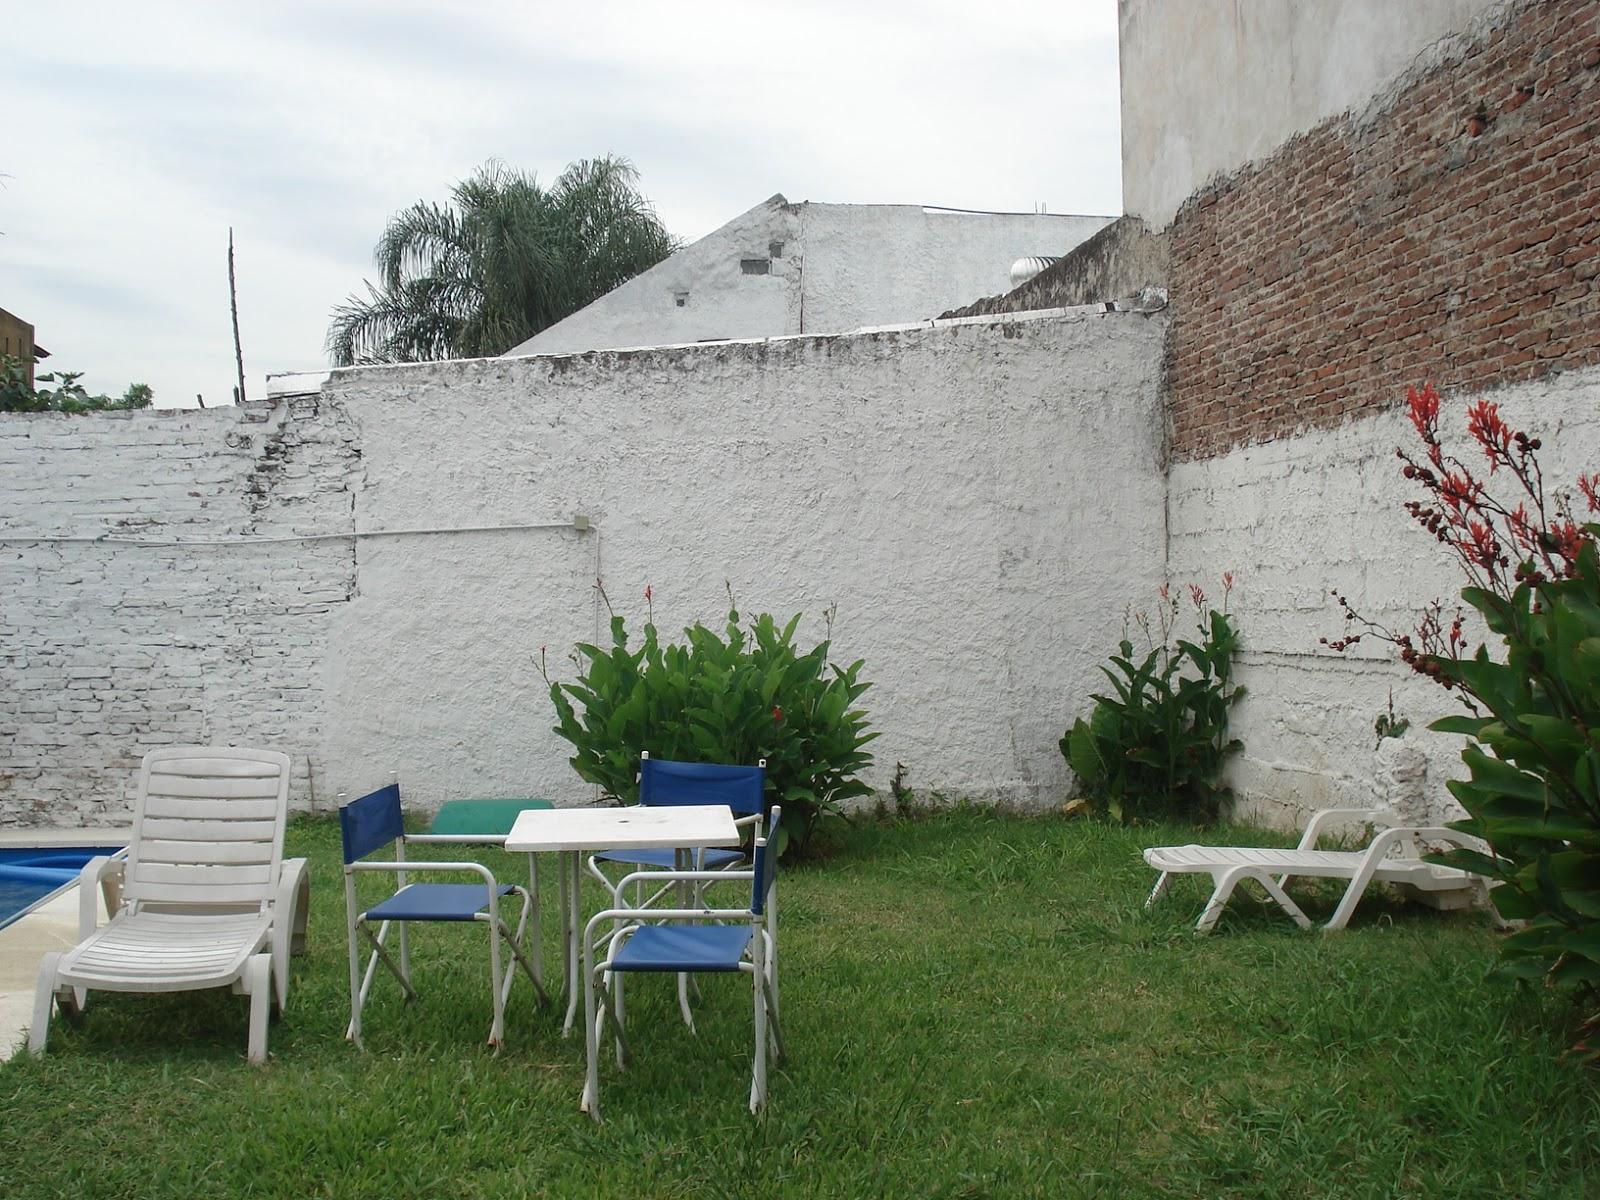 Reverdir jardineria y paisajismo jardin con medianera for Jardineria y paisajismo